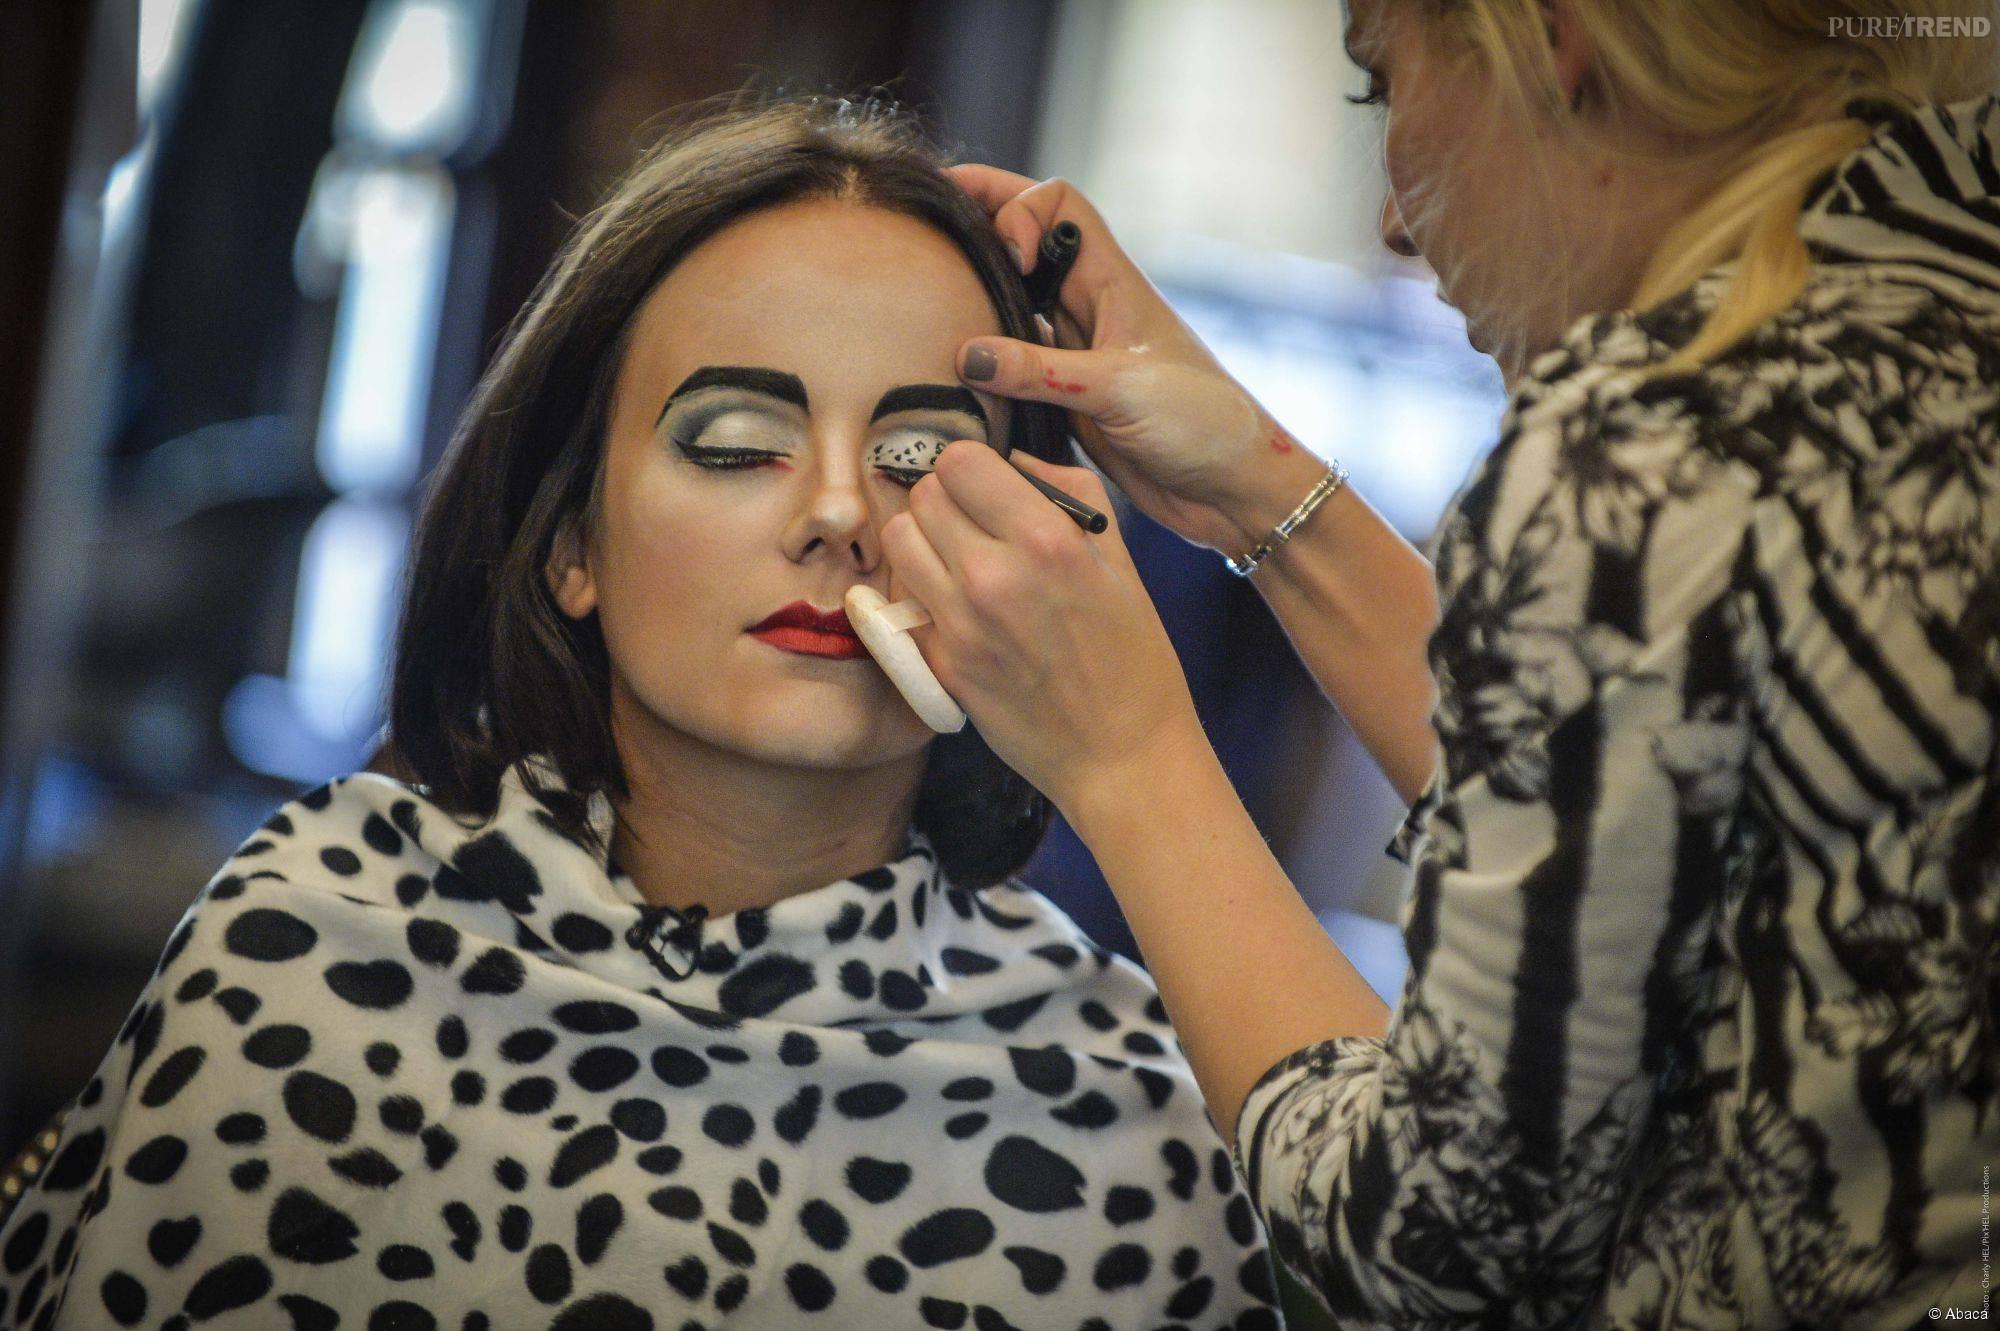 1518117-seance-make-up-pour-la-chanteuse-5800x0-2